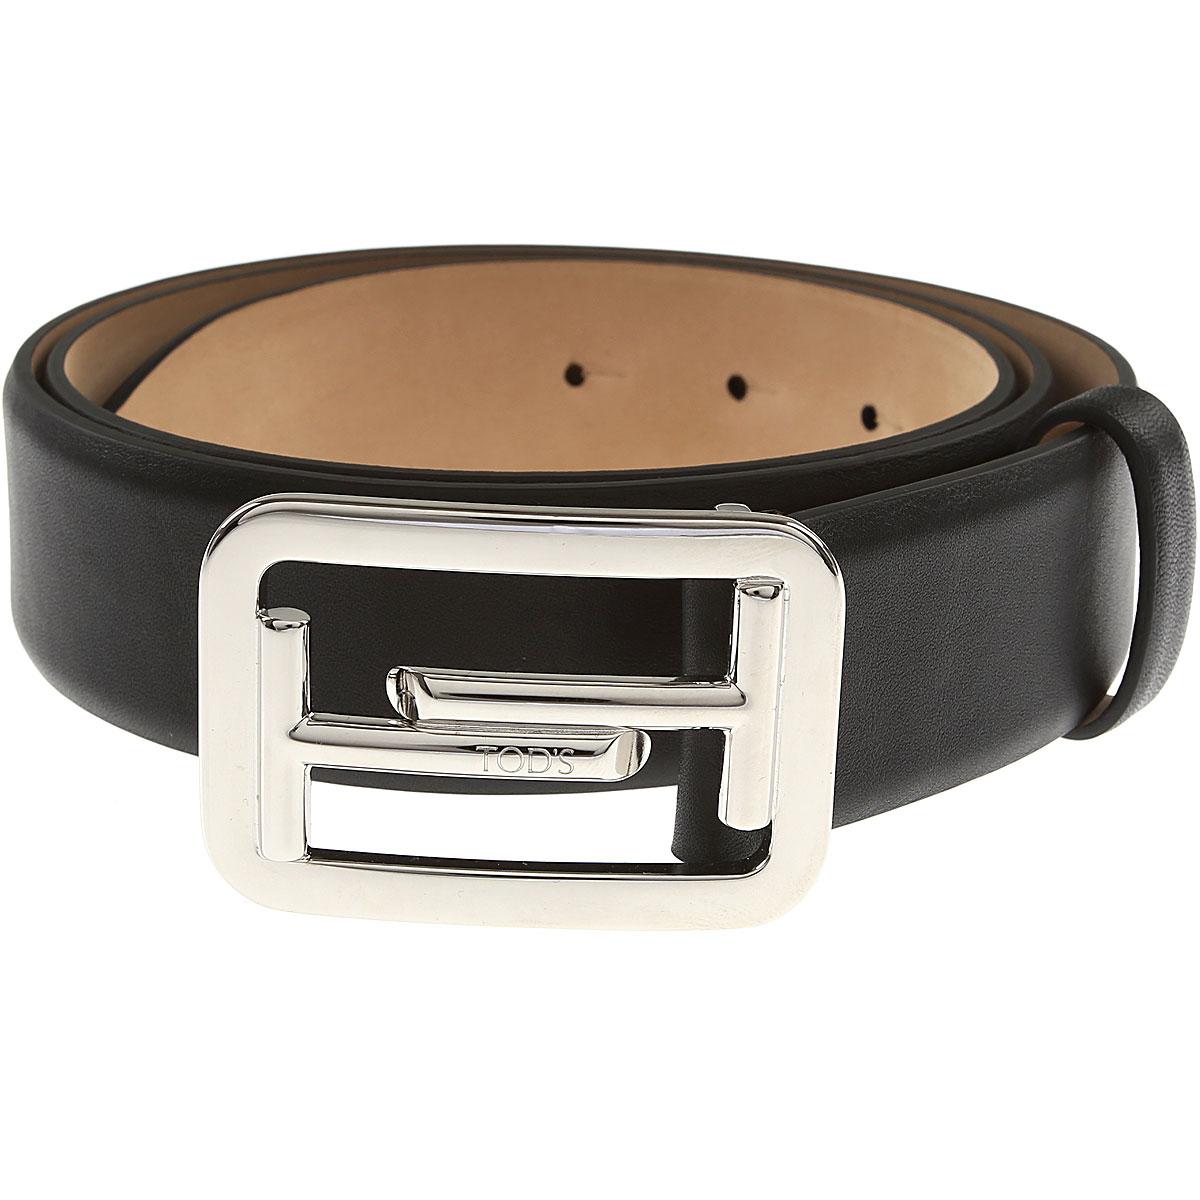 Tods Mens Belts, Black, Leather, 2017, 36 38 40 42 44 46 48